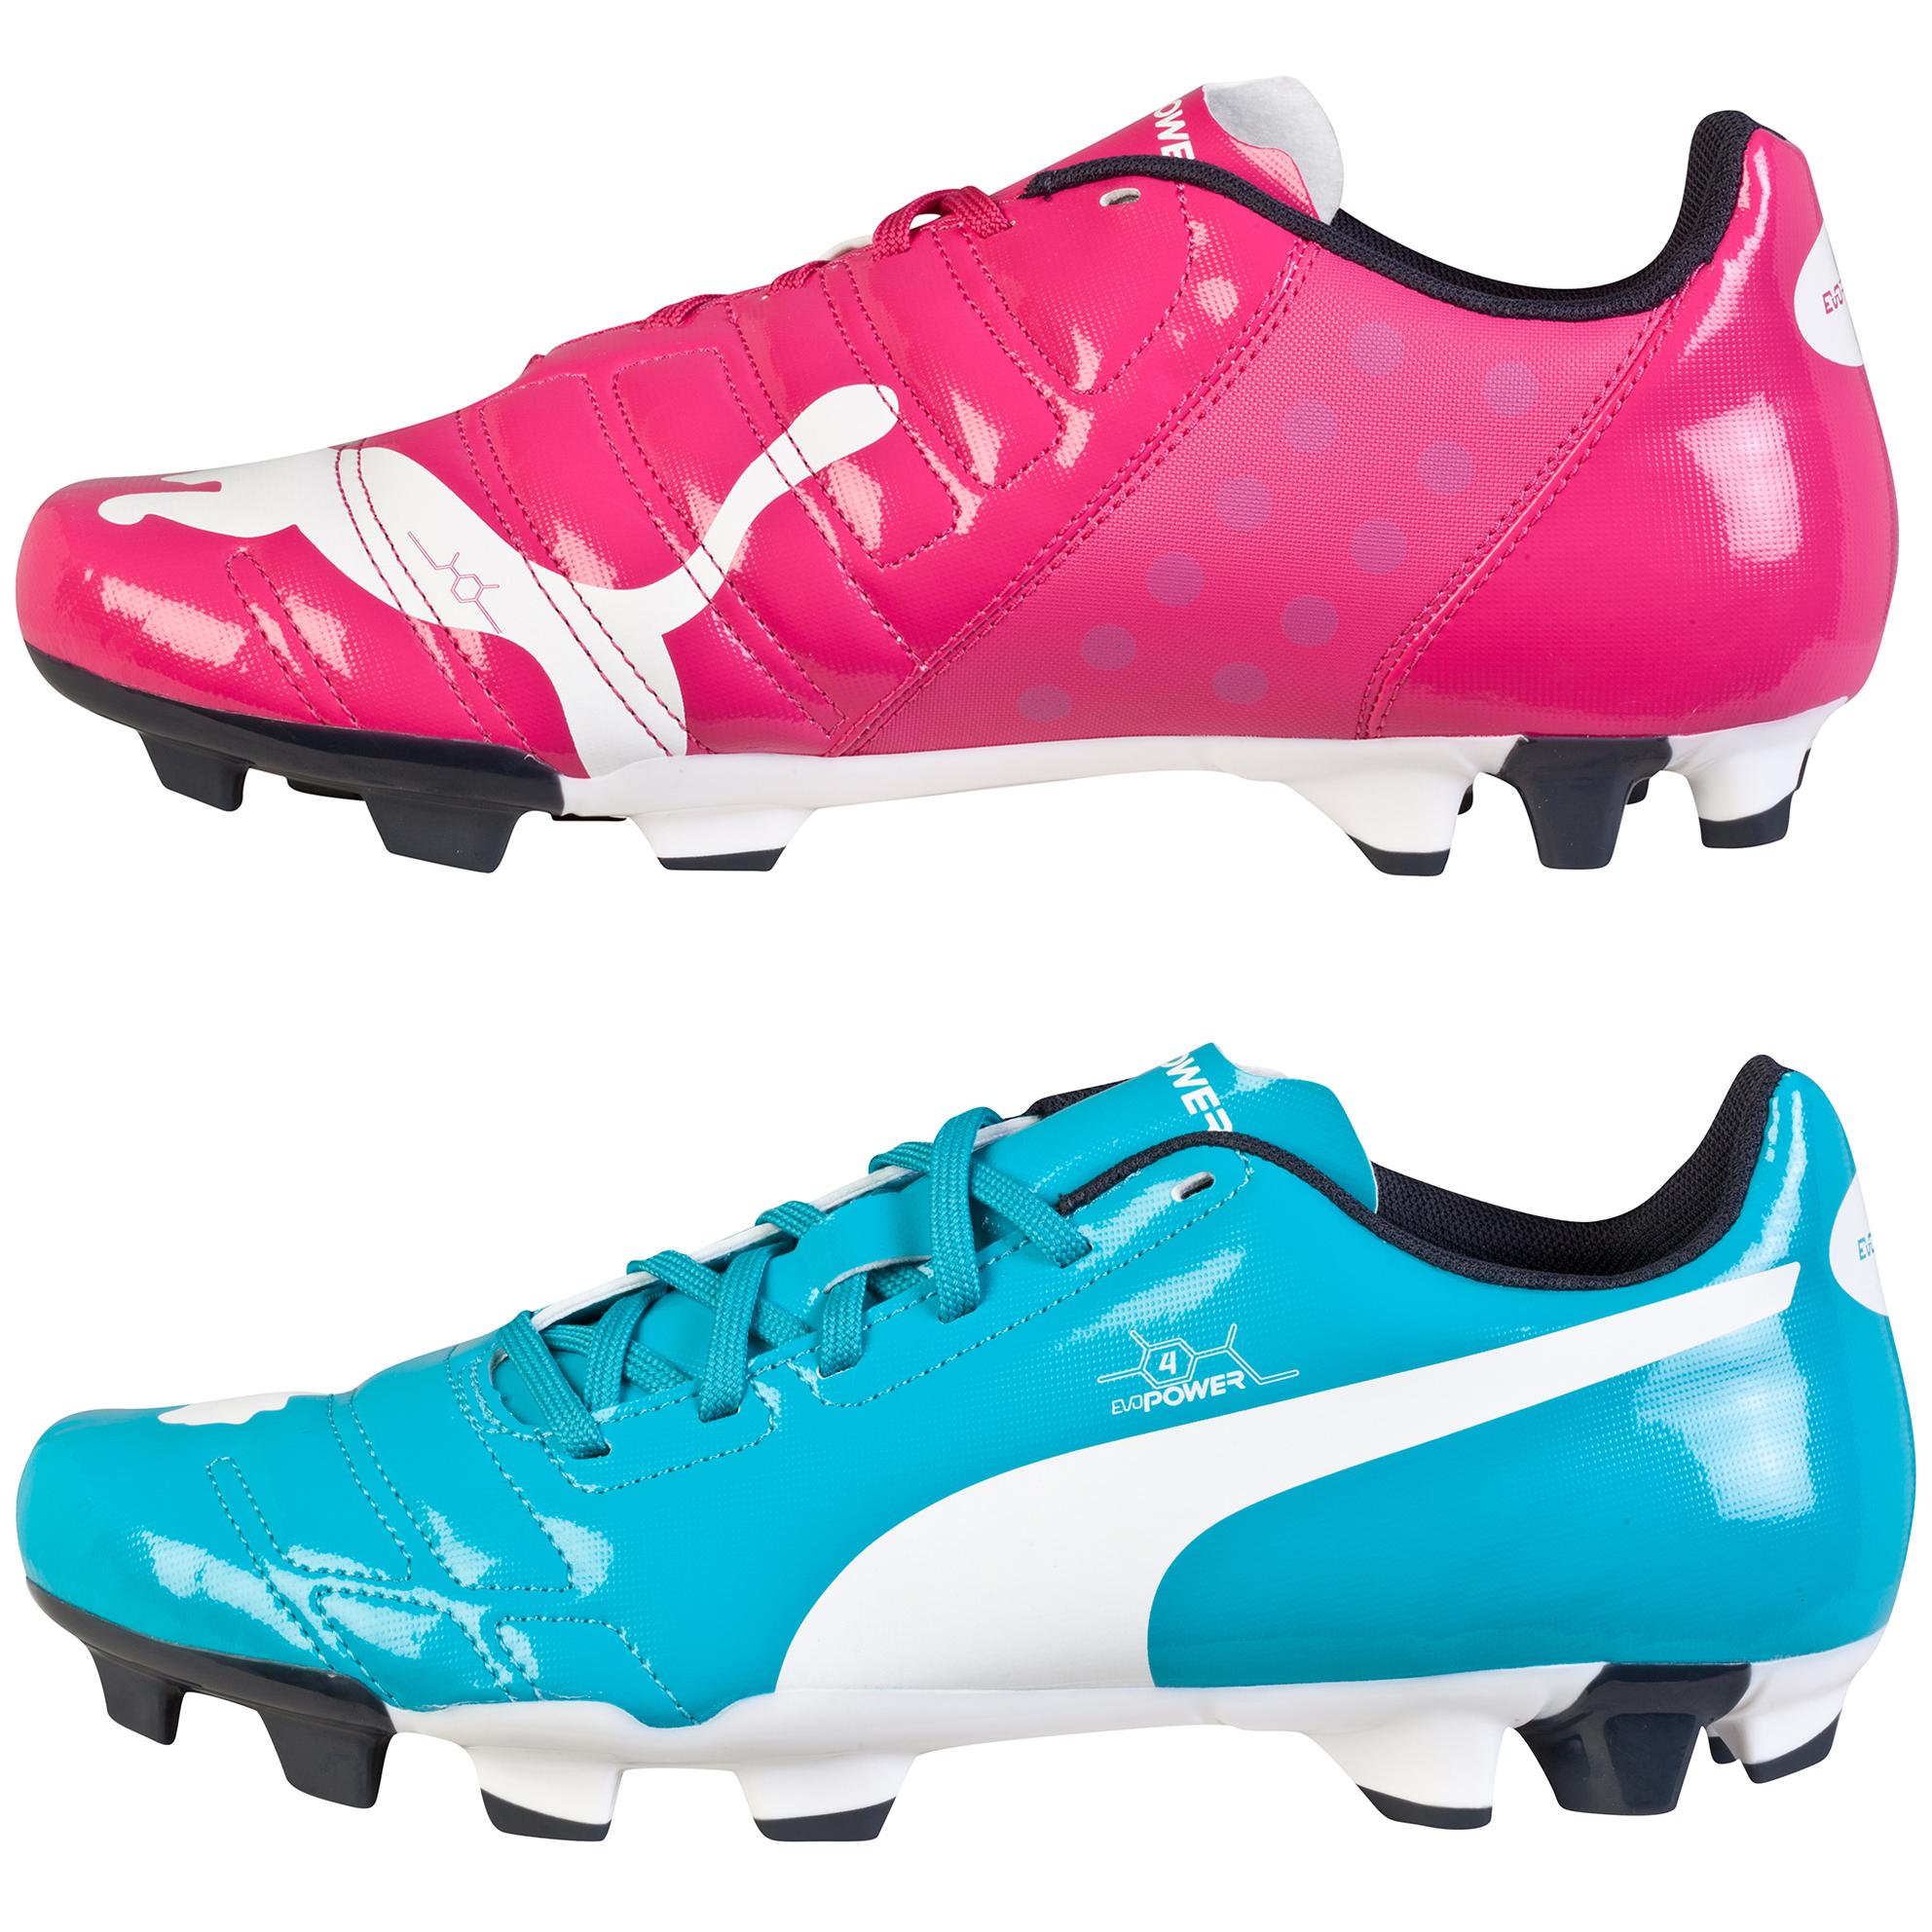 Puma evoPOWER TRICKS 4 Firm Ground Football Boots